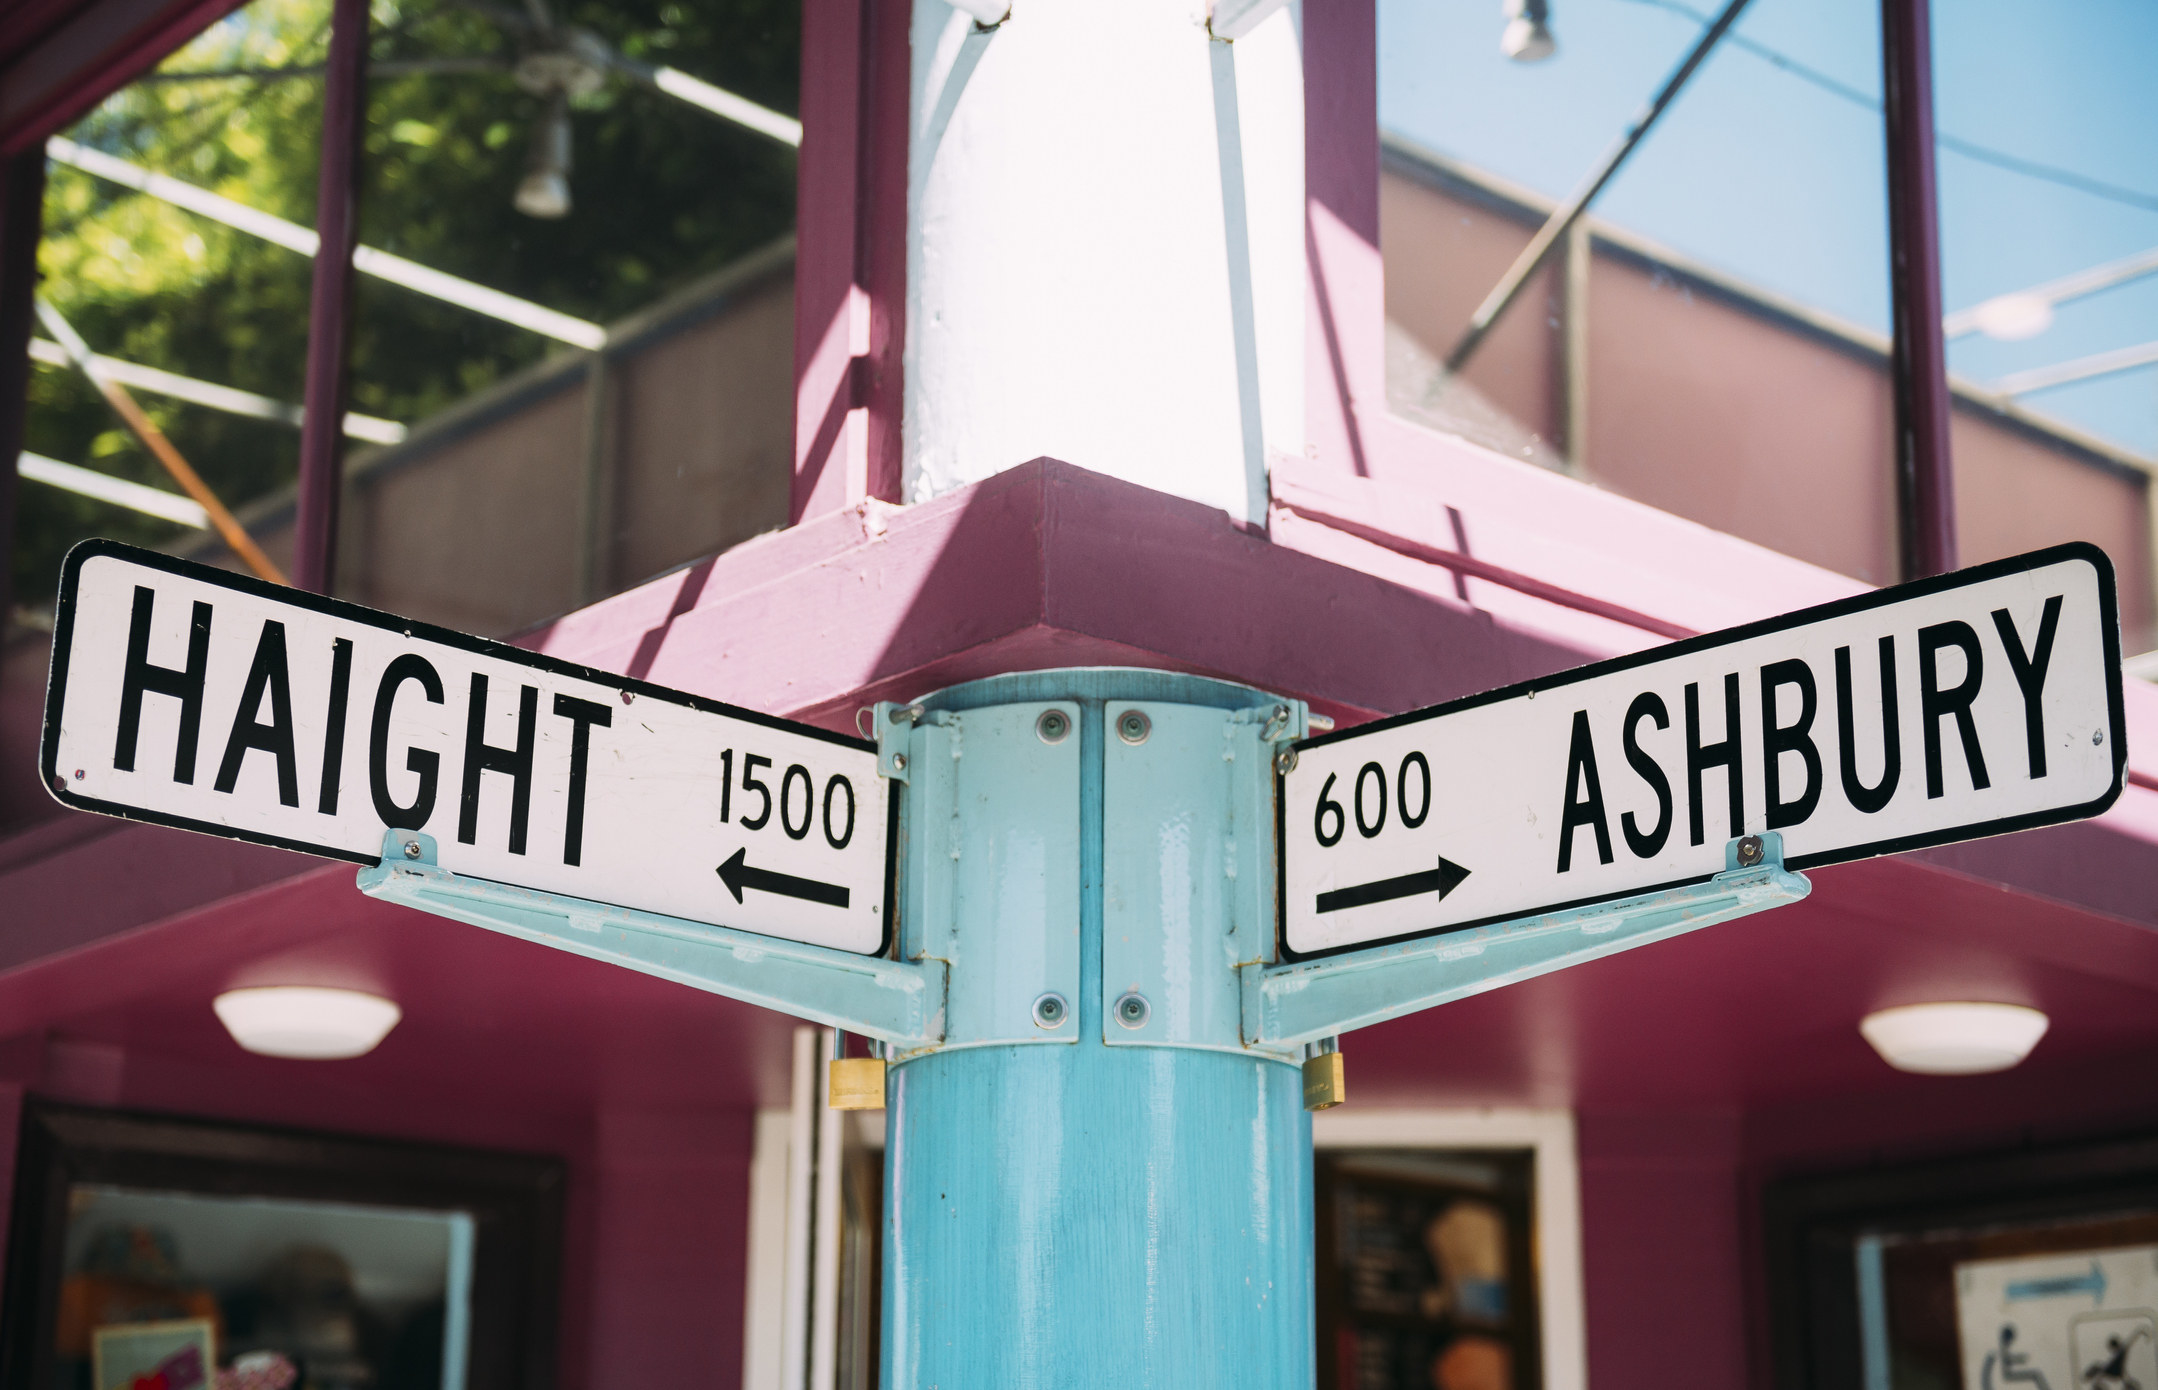 The Haight Ashbury sign